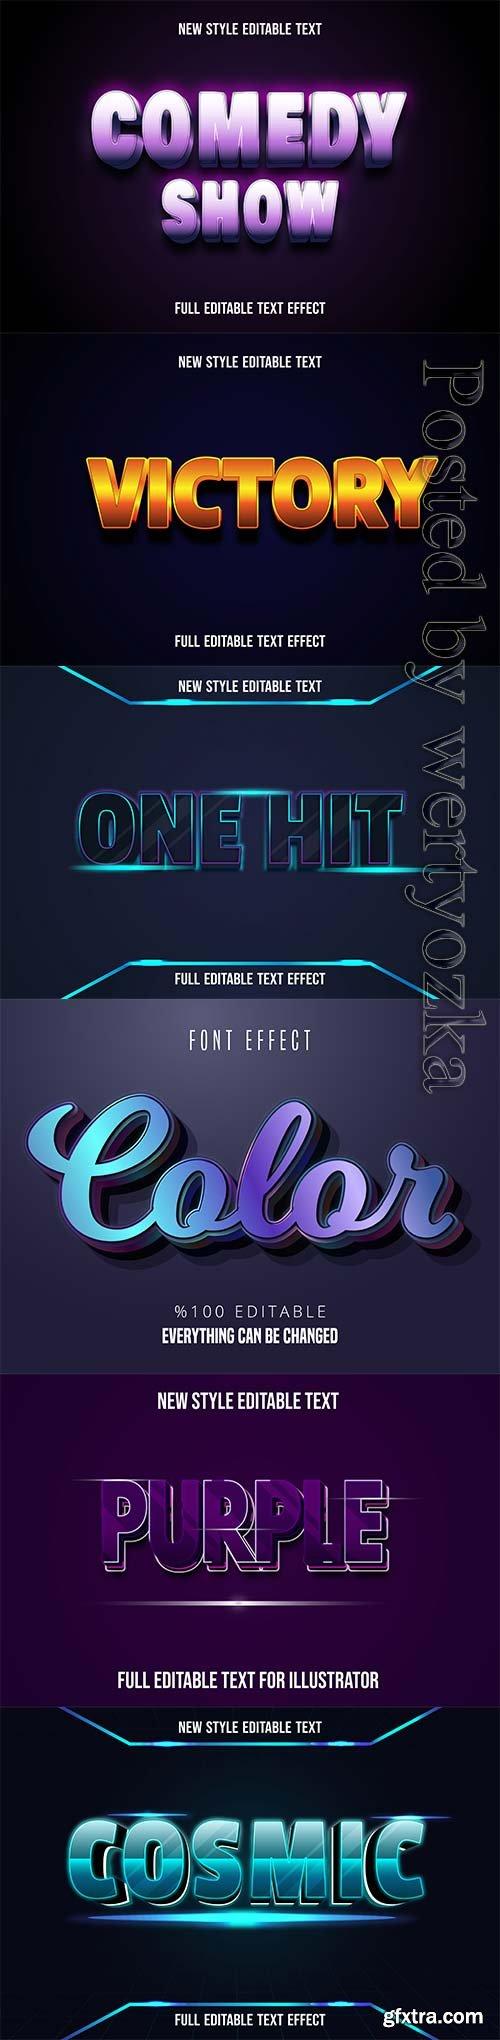 3d editable text style effect vector vol 241